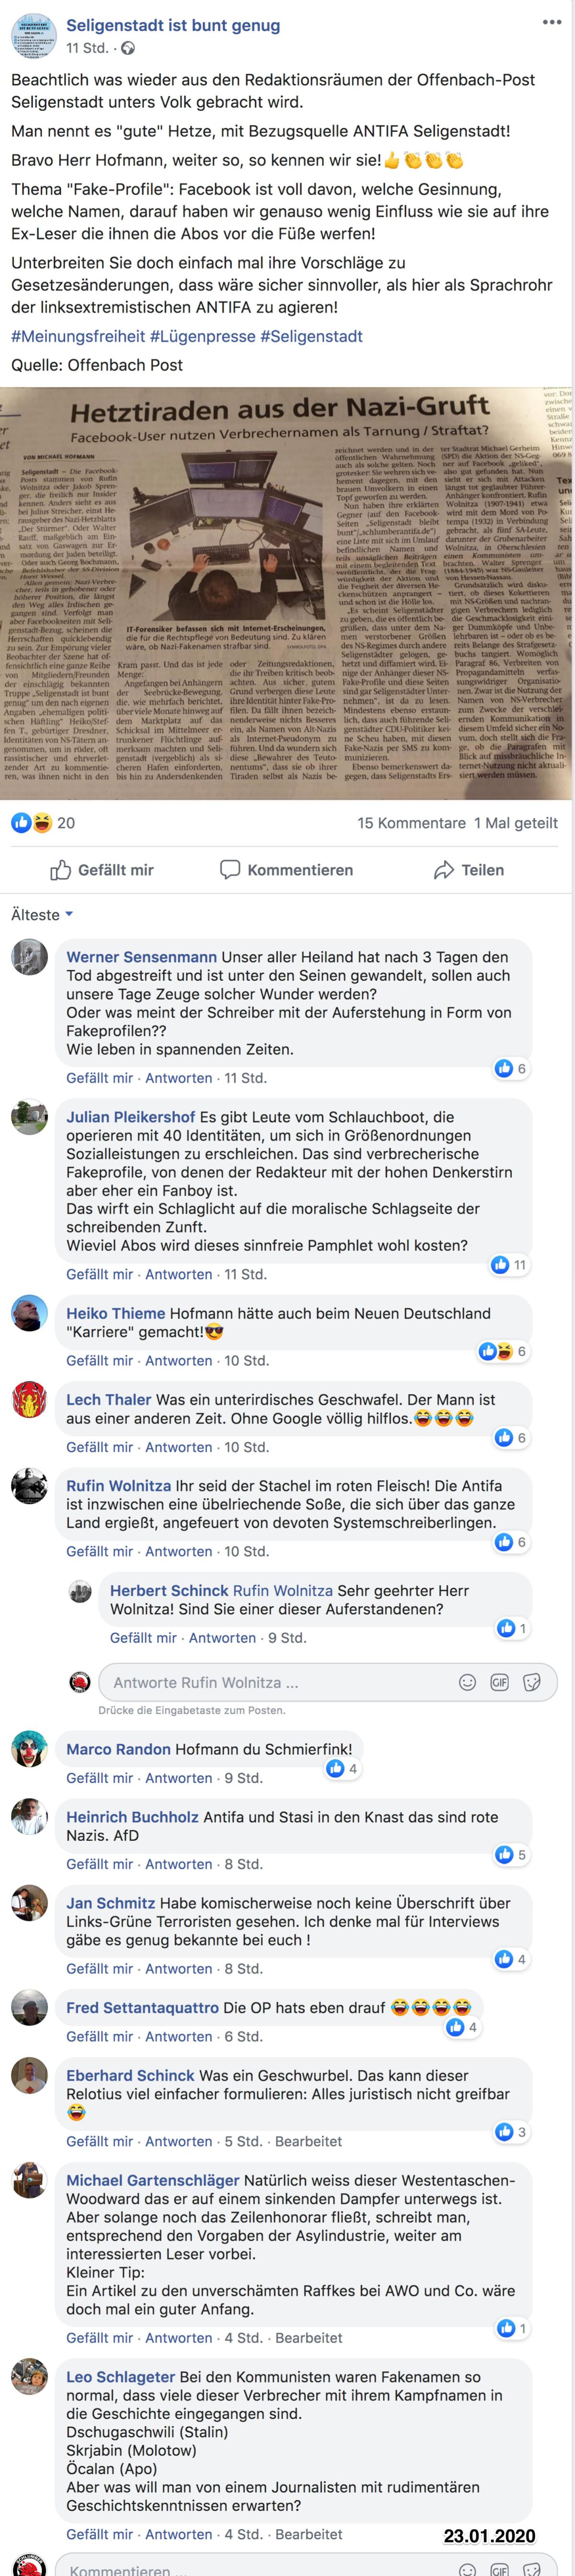 FgAS,Fridays gegen Altersarmut Seligenstadt pic_20542